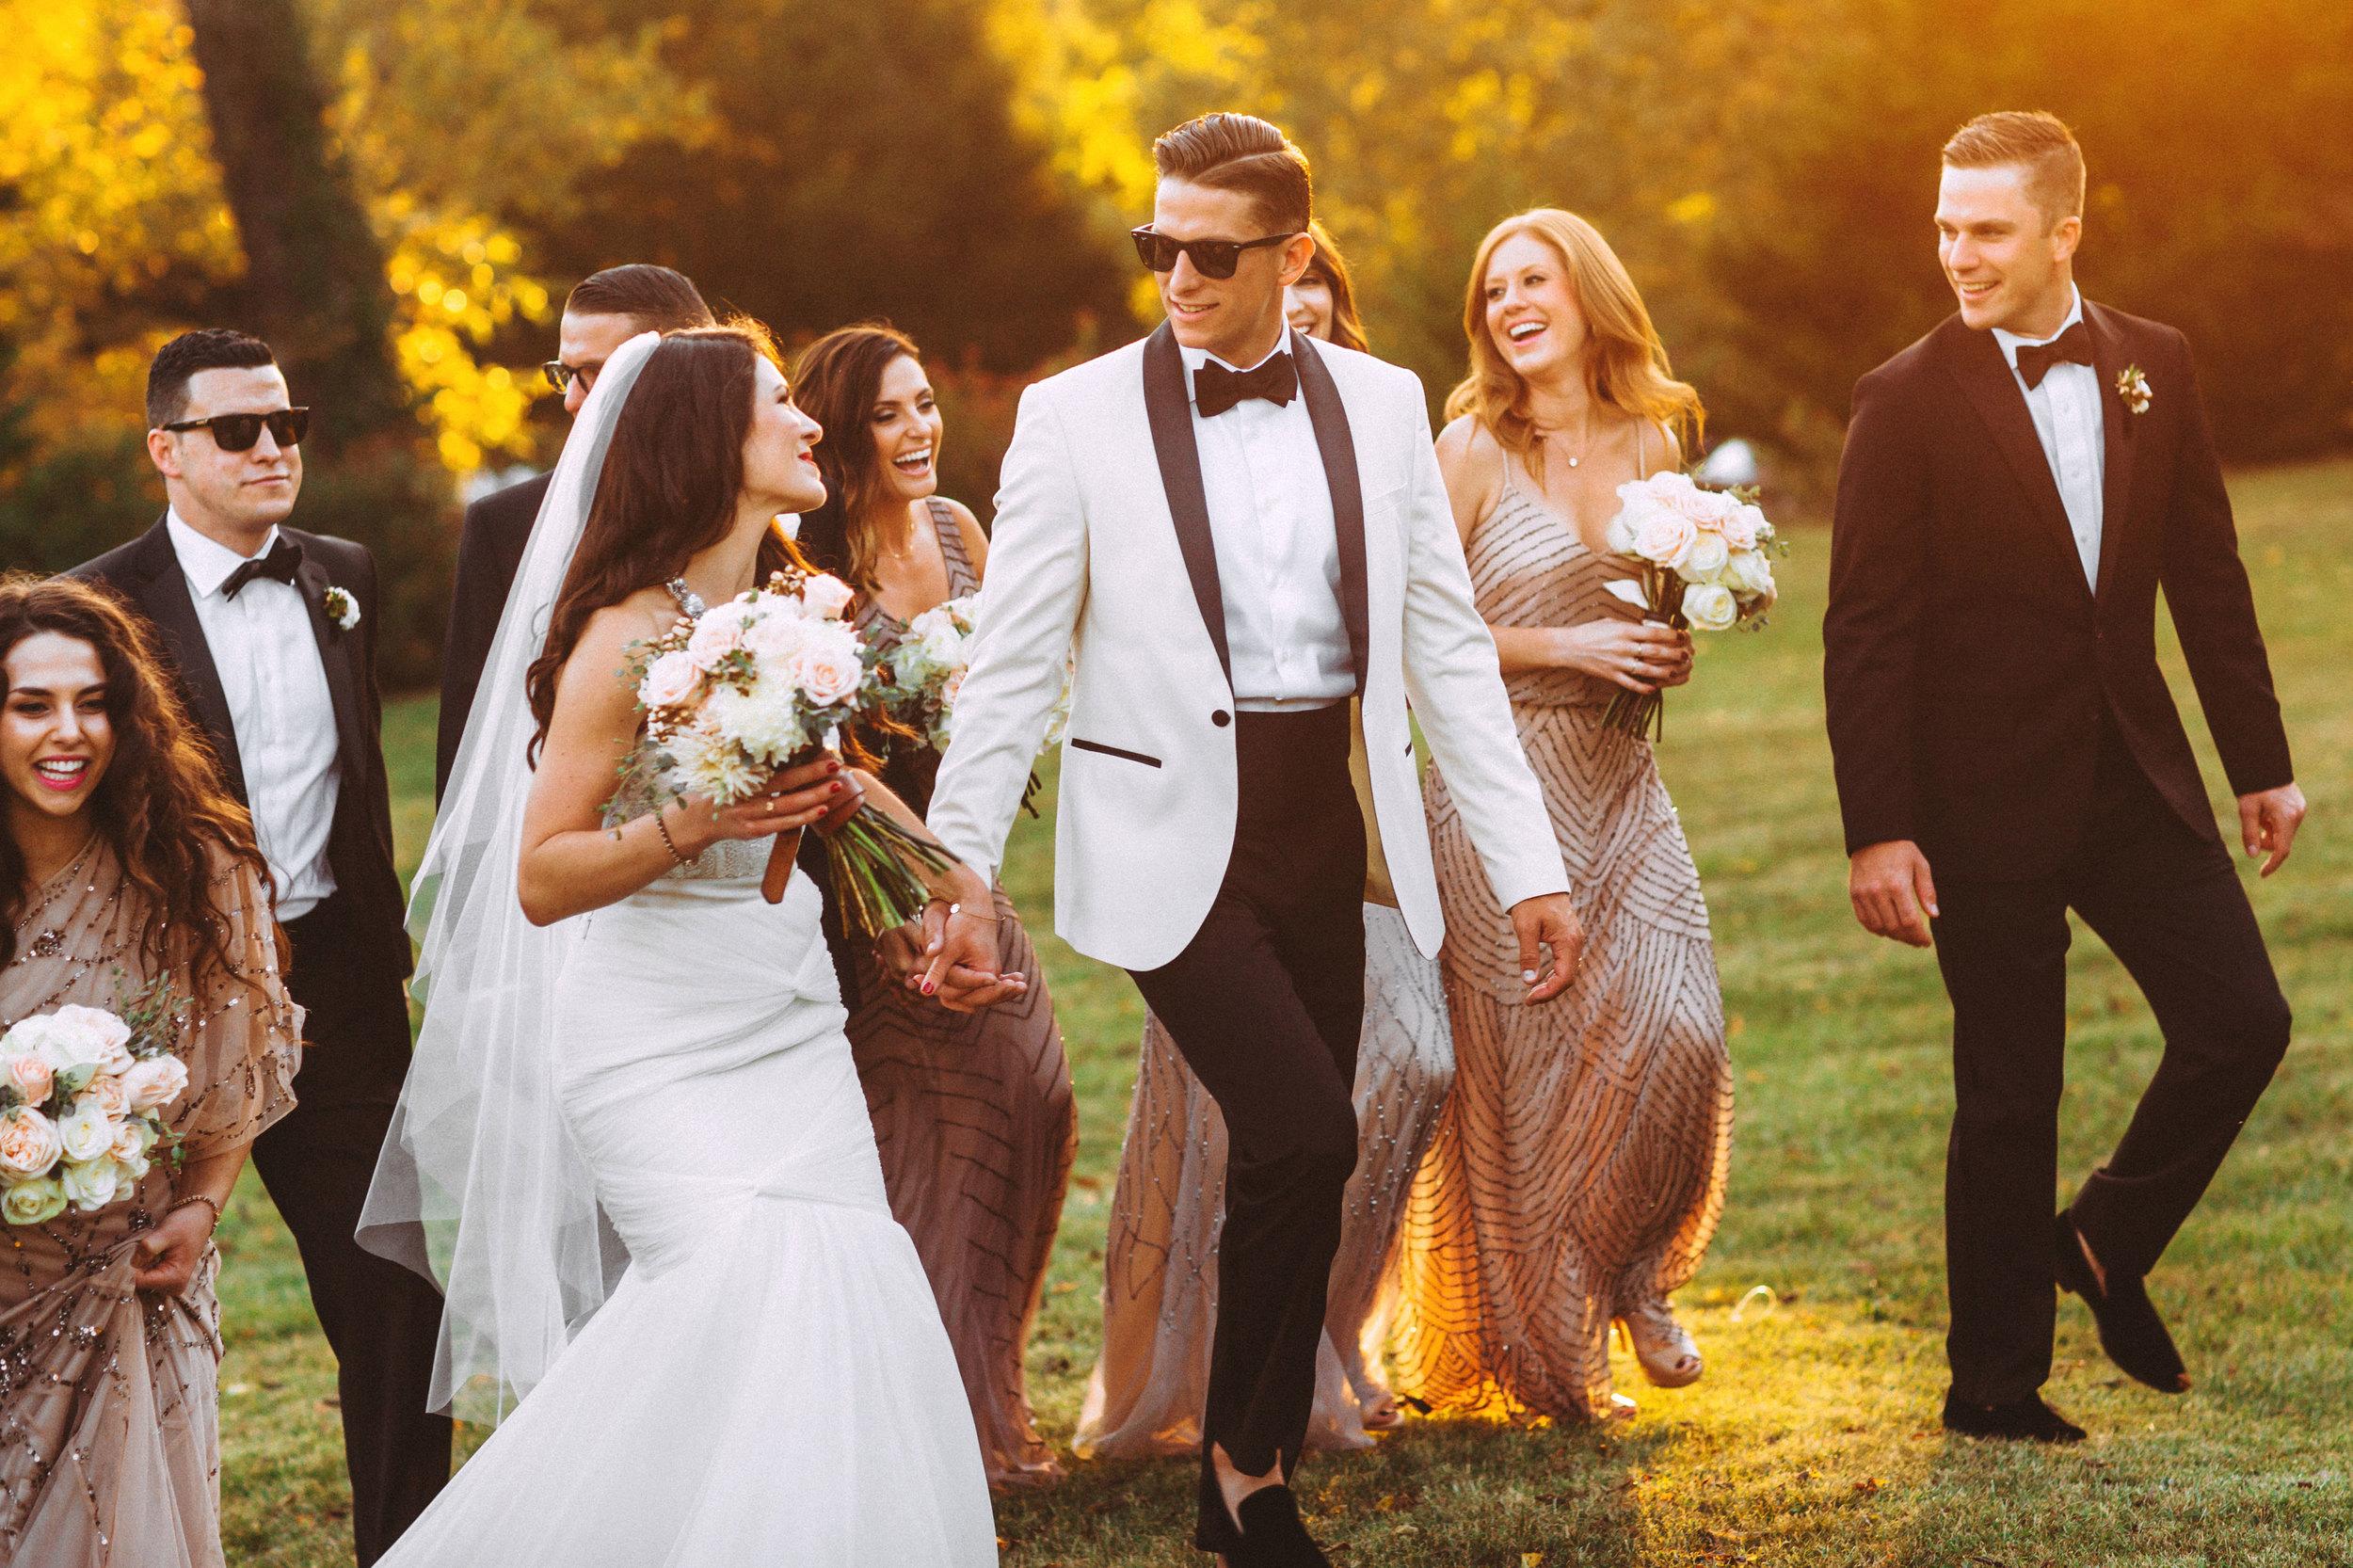 Me & Mr. Jones Wedding, Informal Wedding Party Photos, Black Tie Wedding, Groom Wearing White ASOS Tuxedo, Watters Carina Corset, Watters Amina Skirt